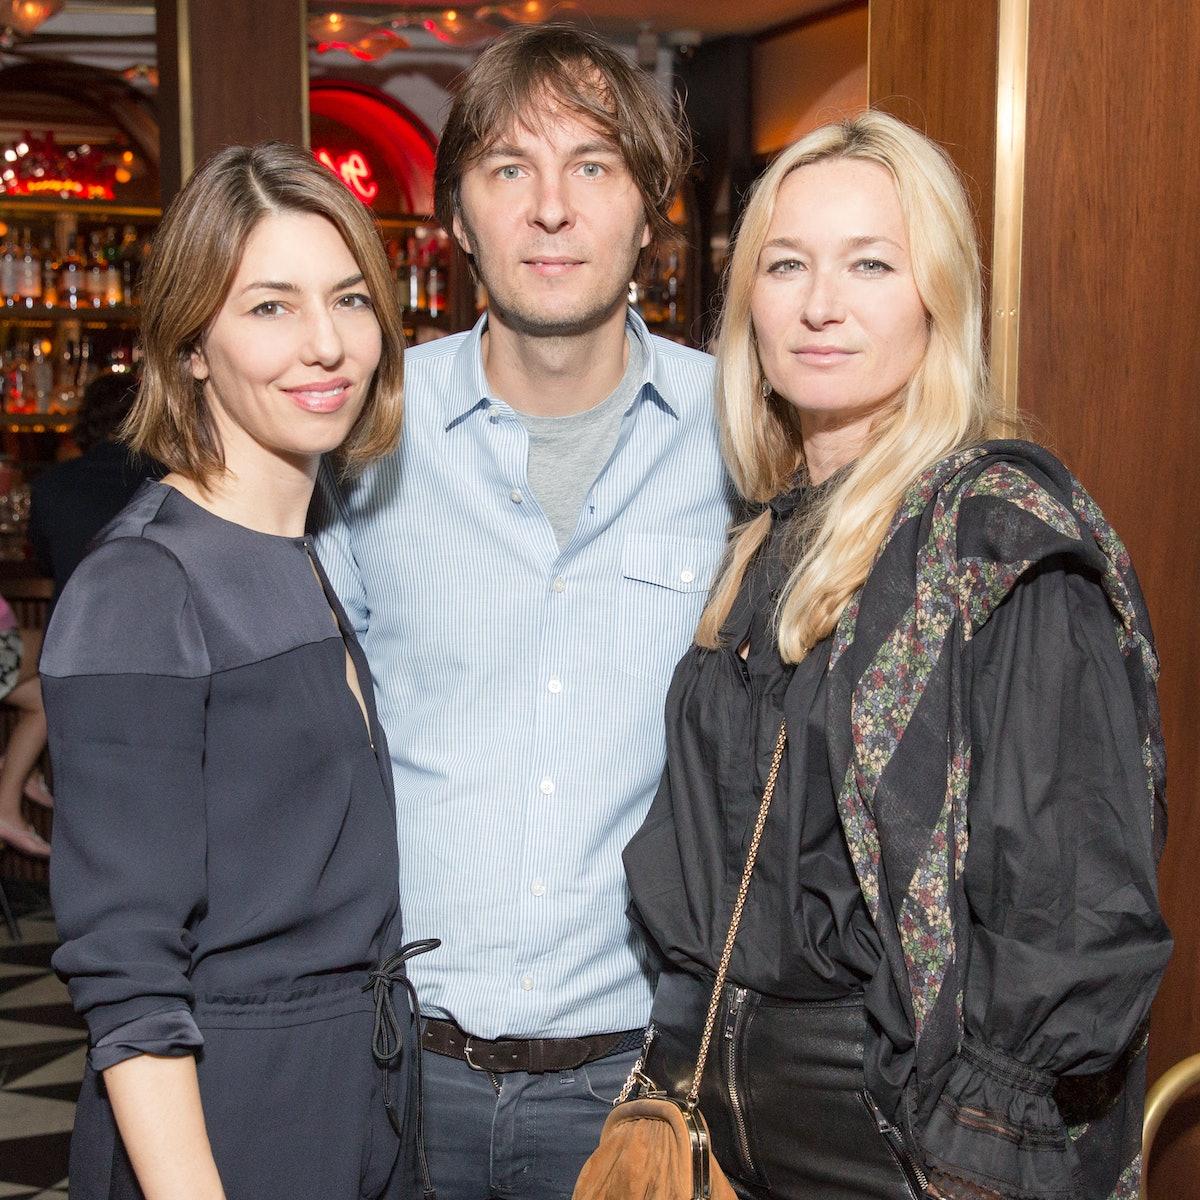 Sofia Coppola, Thomas Mars, and Julie de Libran